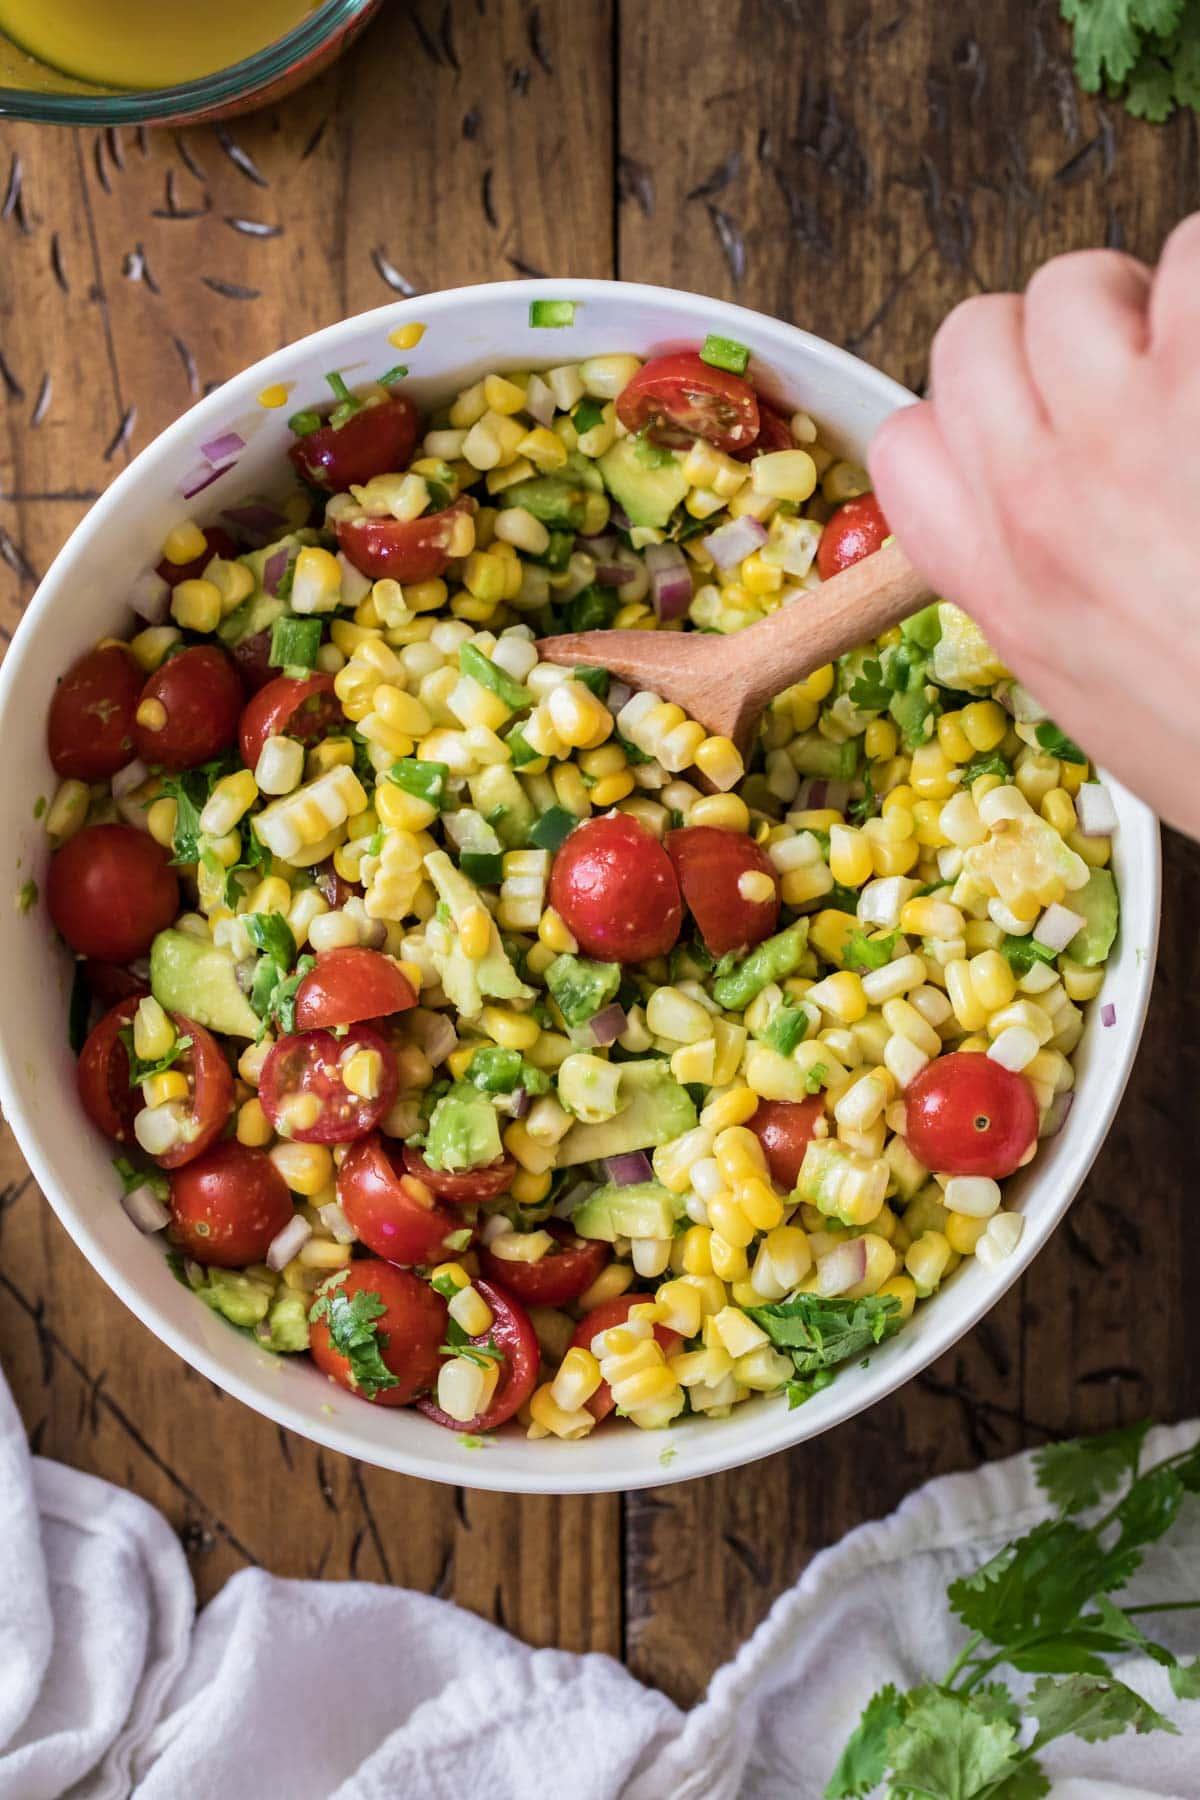 Preparing corn salad by combining ingredients